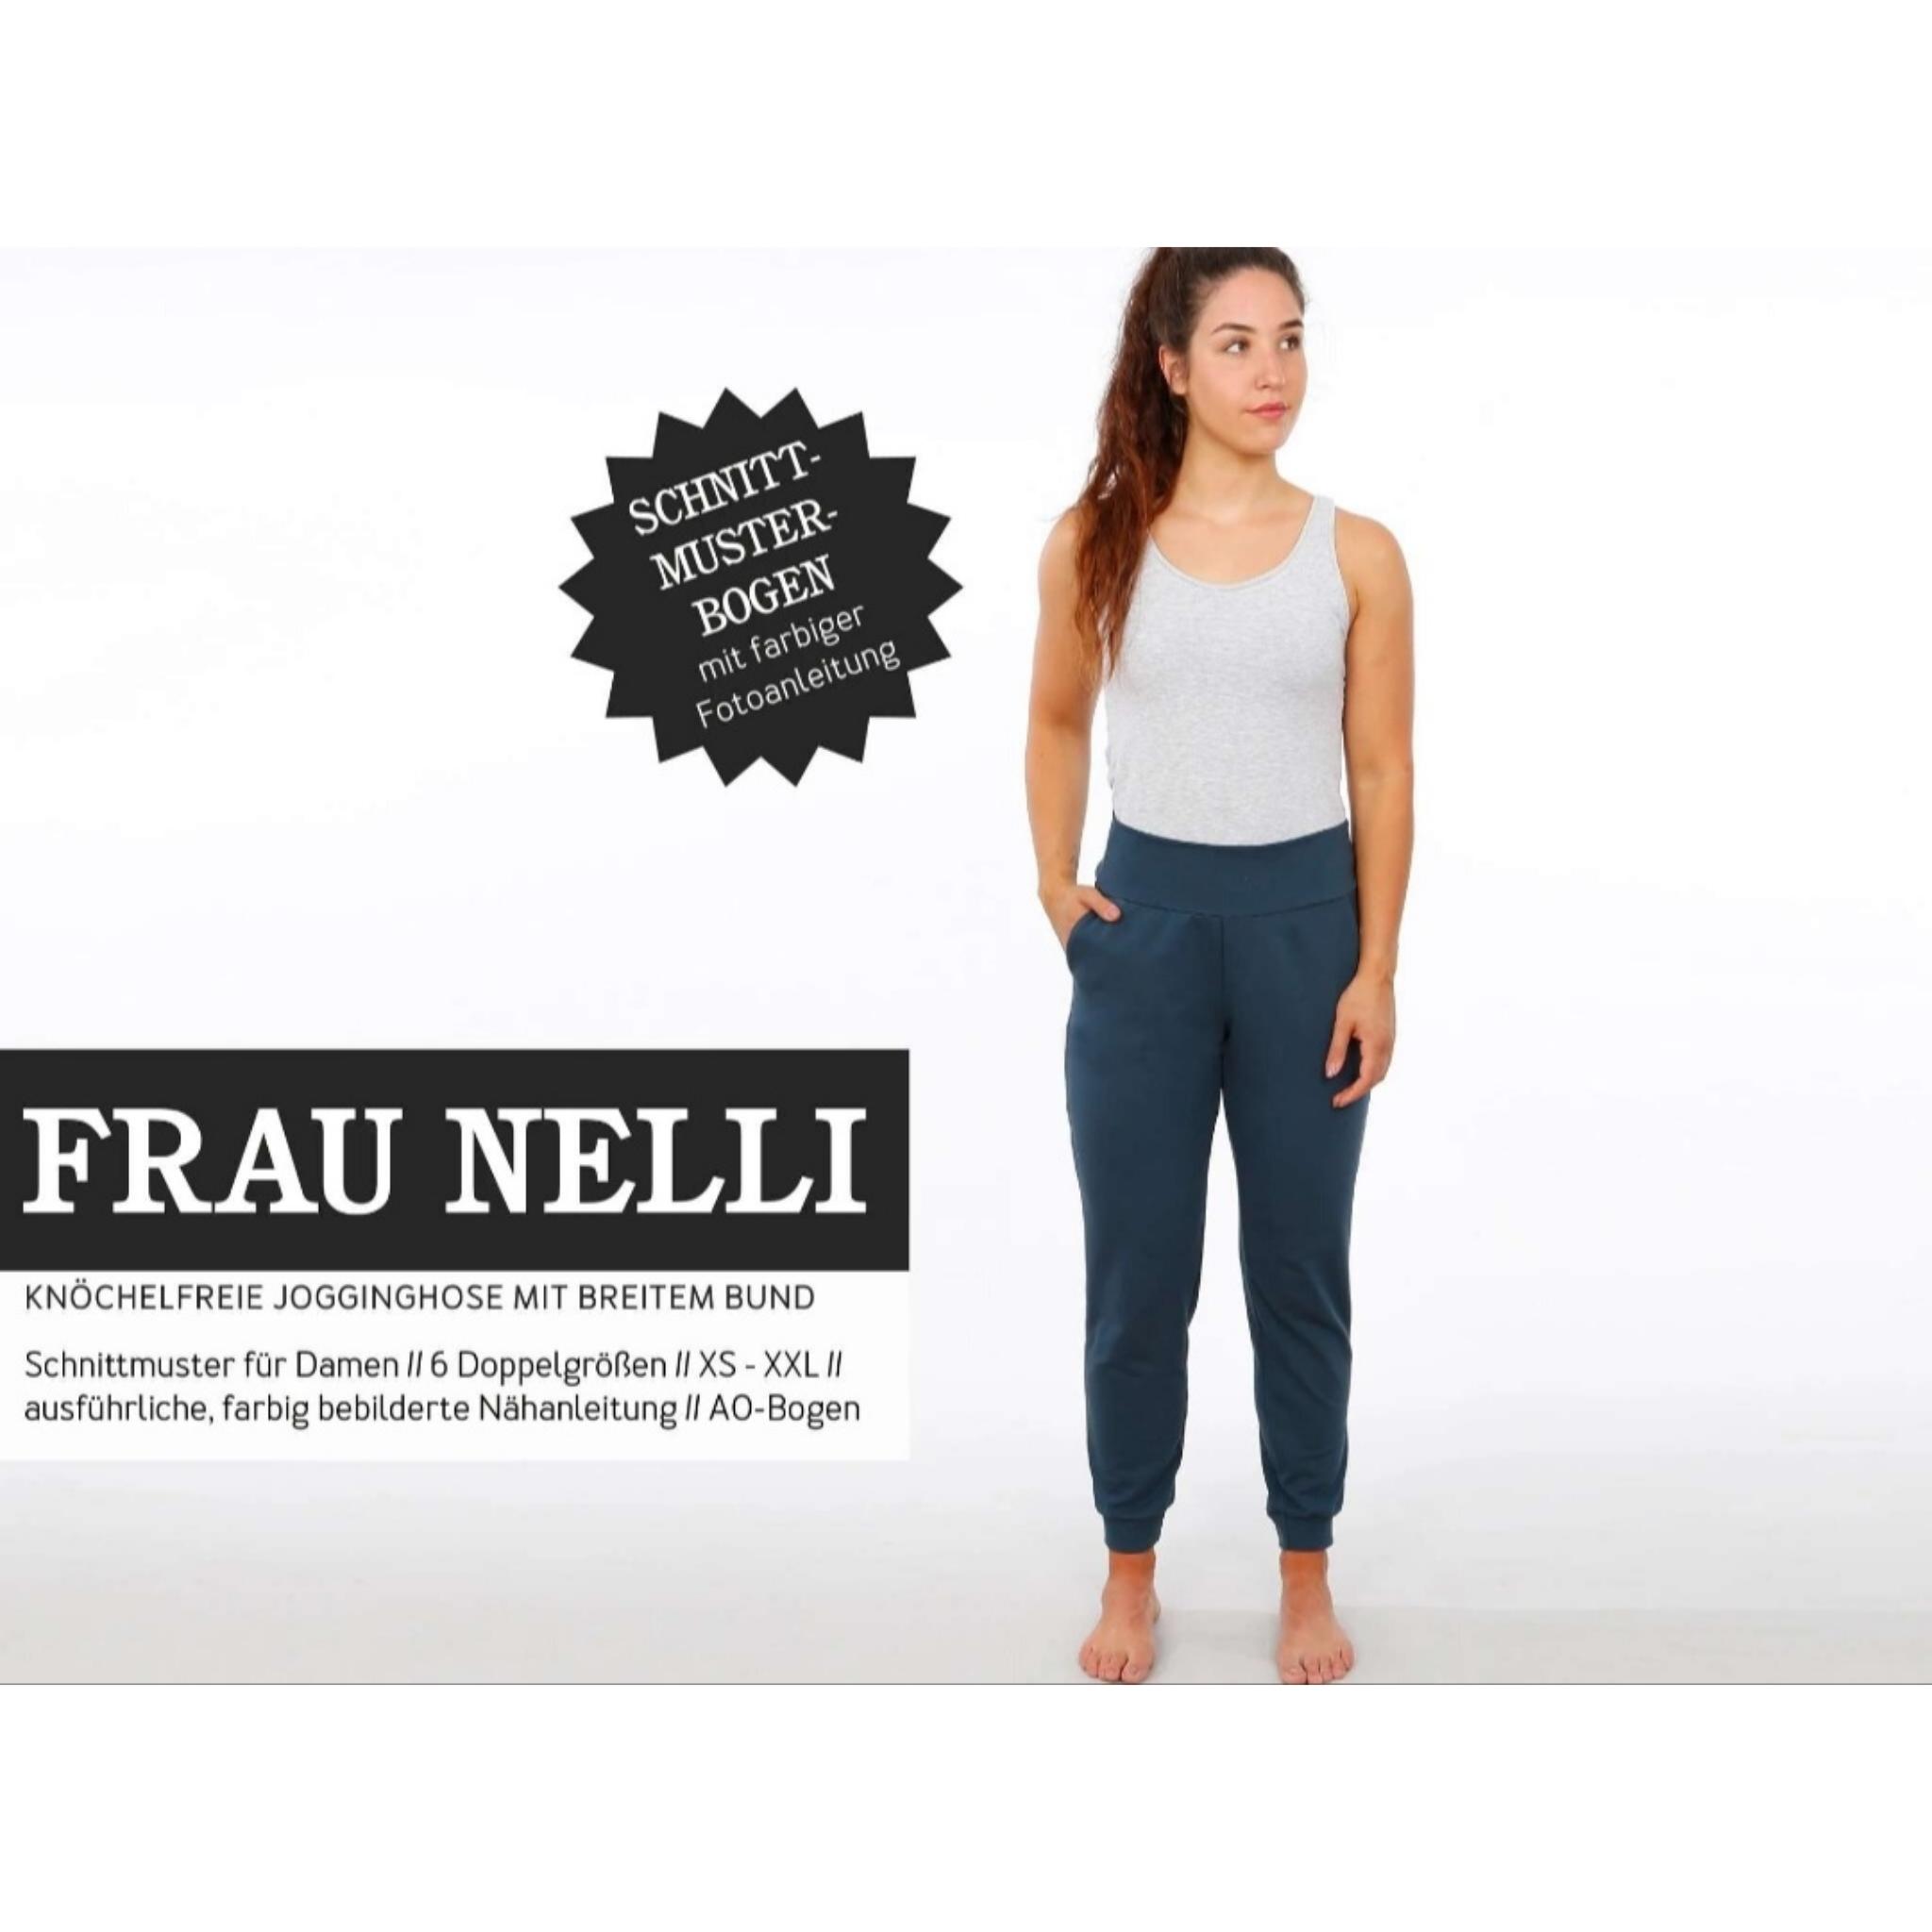 FRAU NELLI schnittmuster studio schnittreif